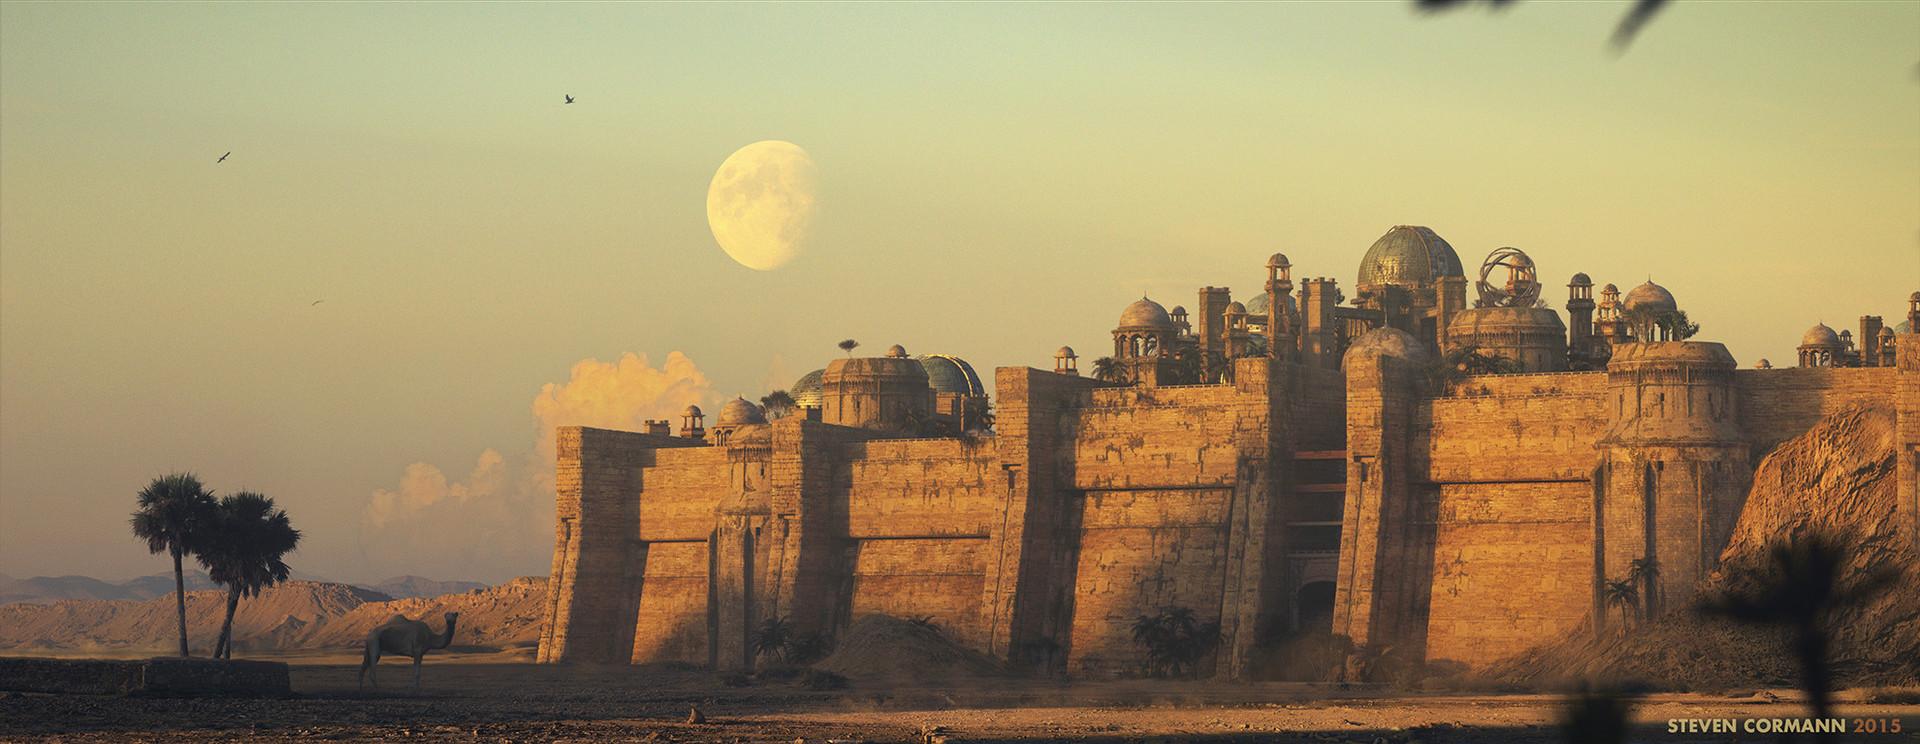 Steven cormann steven cormann desert city screen